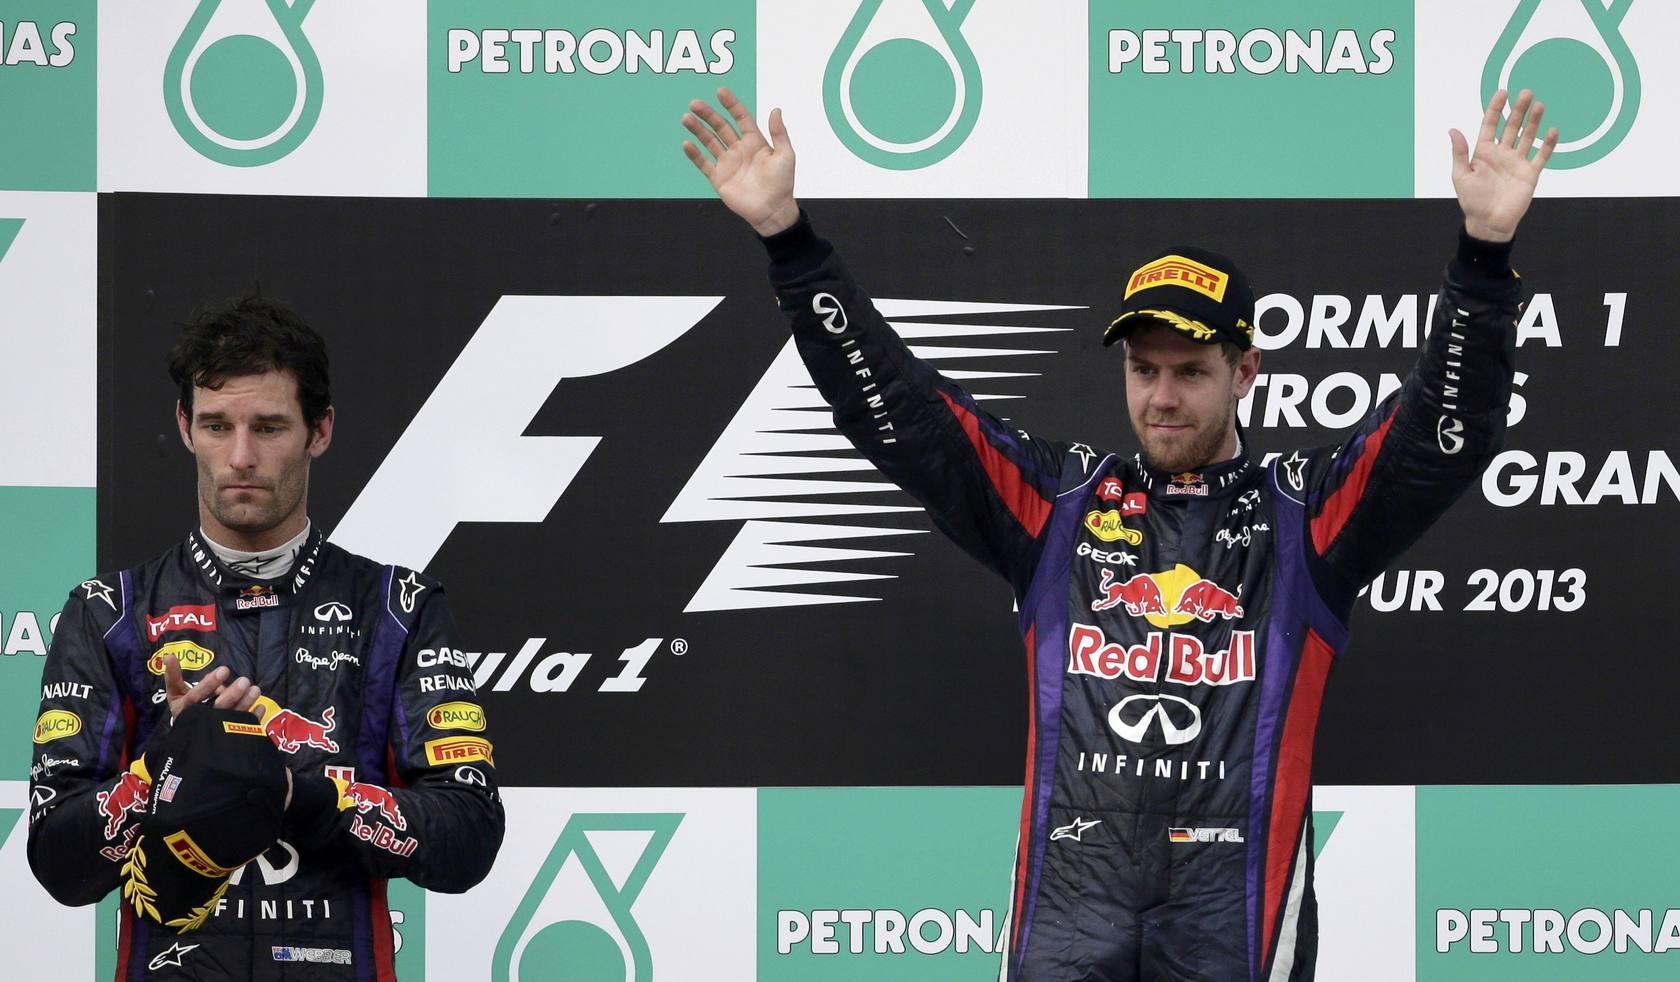 Vettel gana en Sepang en un duelo de Red Bull